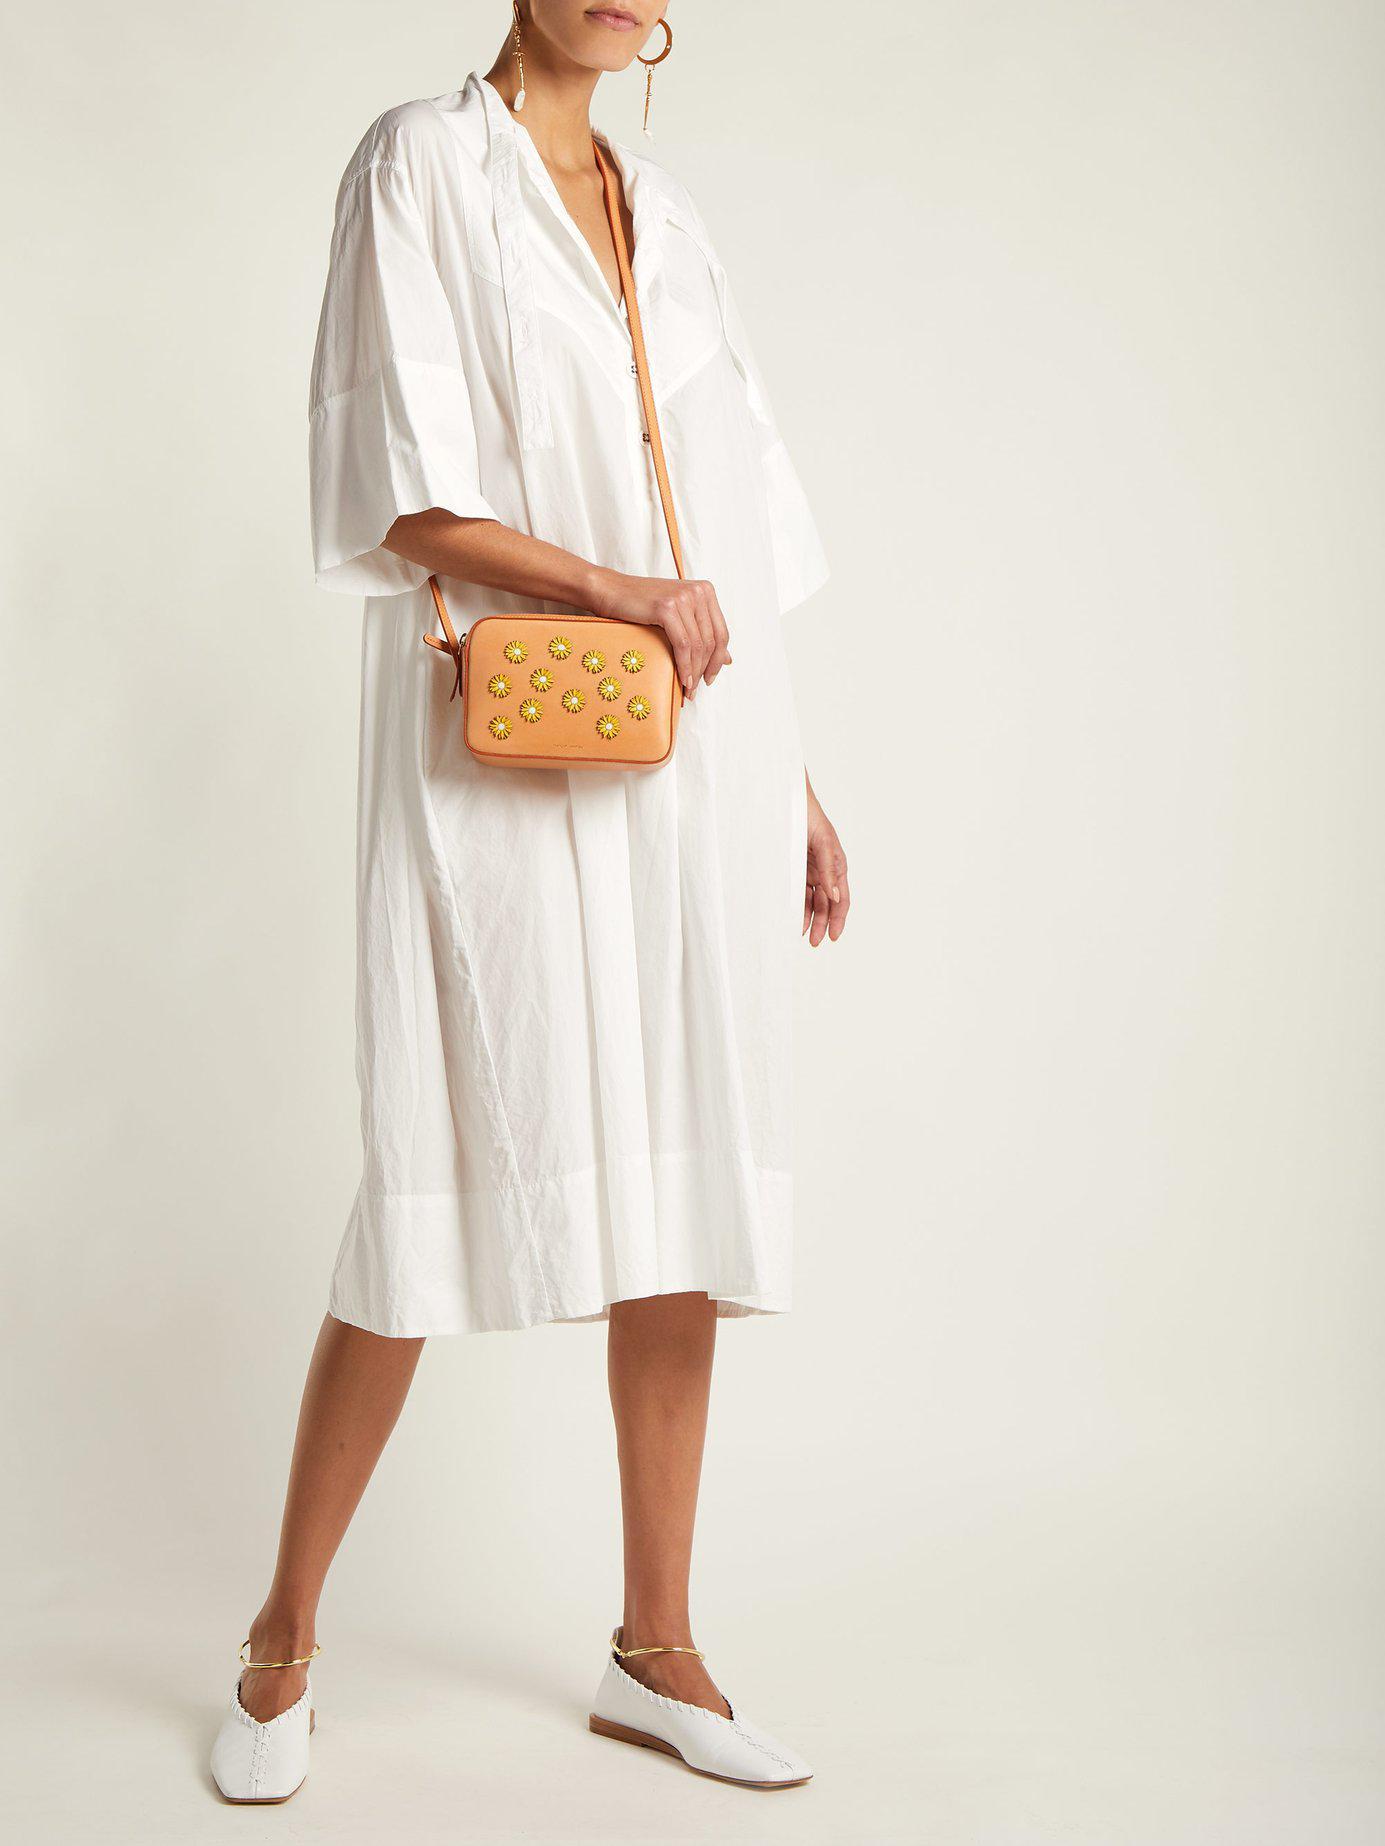 Mansur Gavriel - Multicolor Cammello Floral Embellished Leather Cross Body  Bag - Lyst. View fullscreen 48698f12c59c0